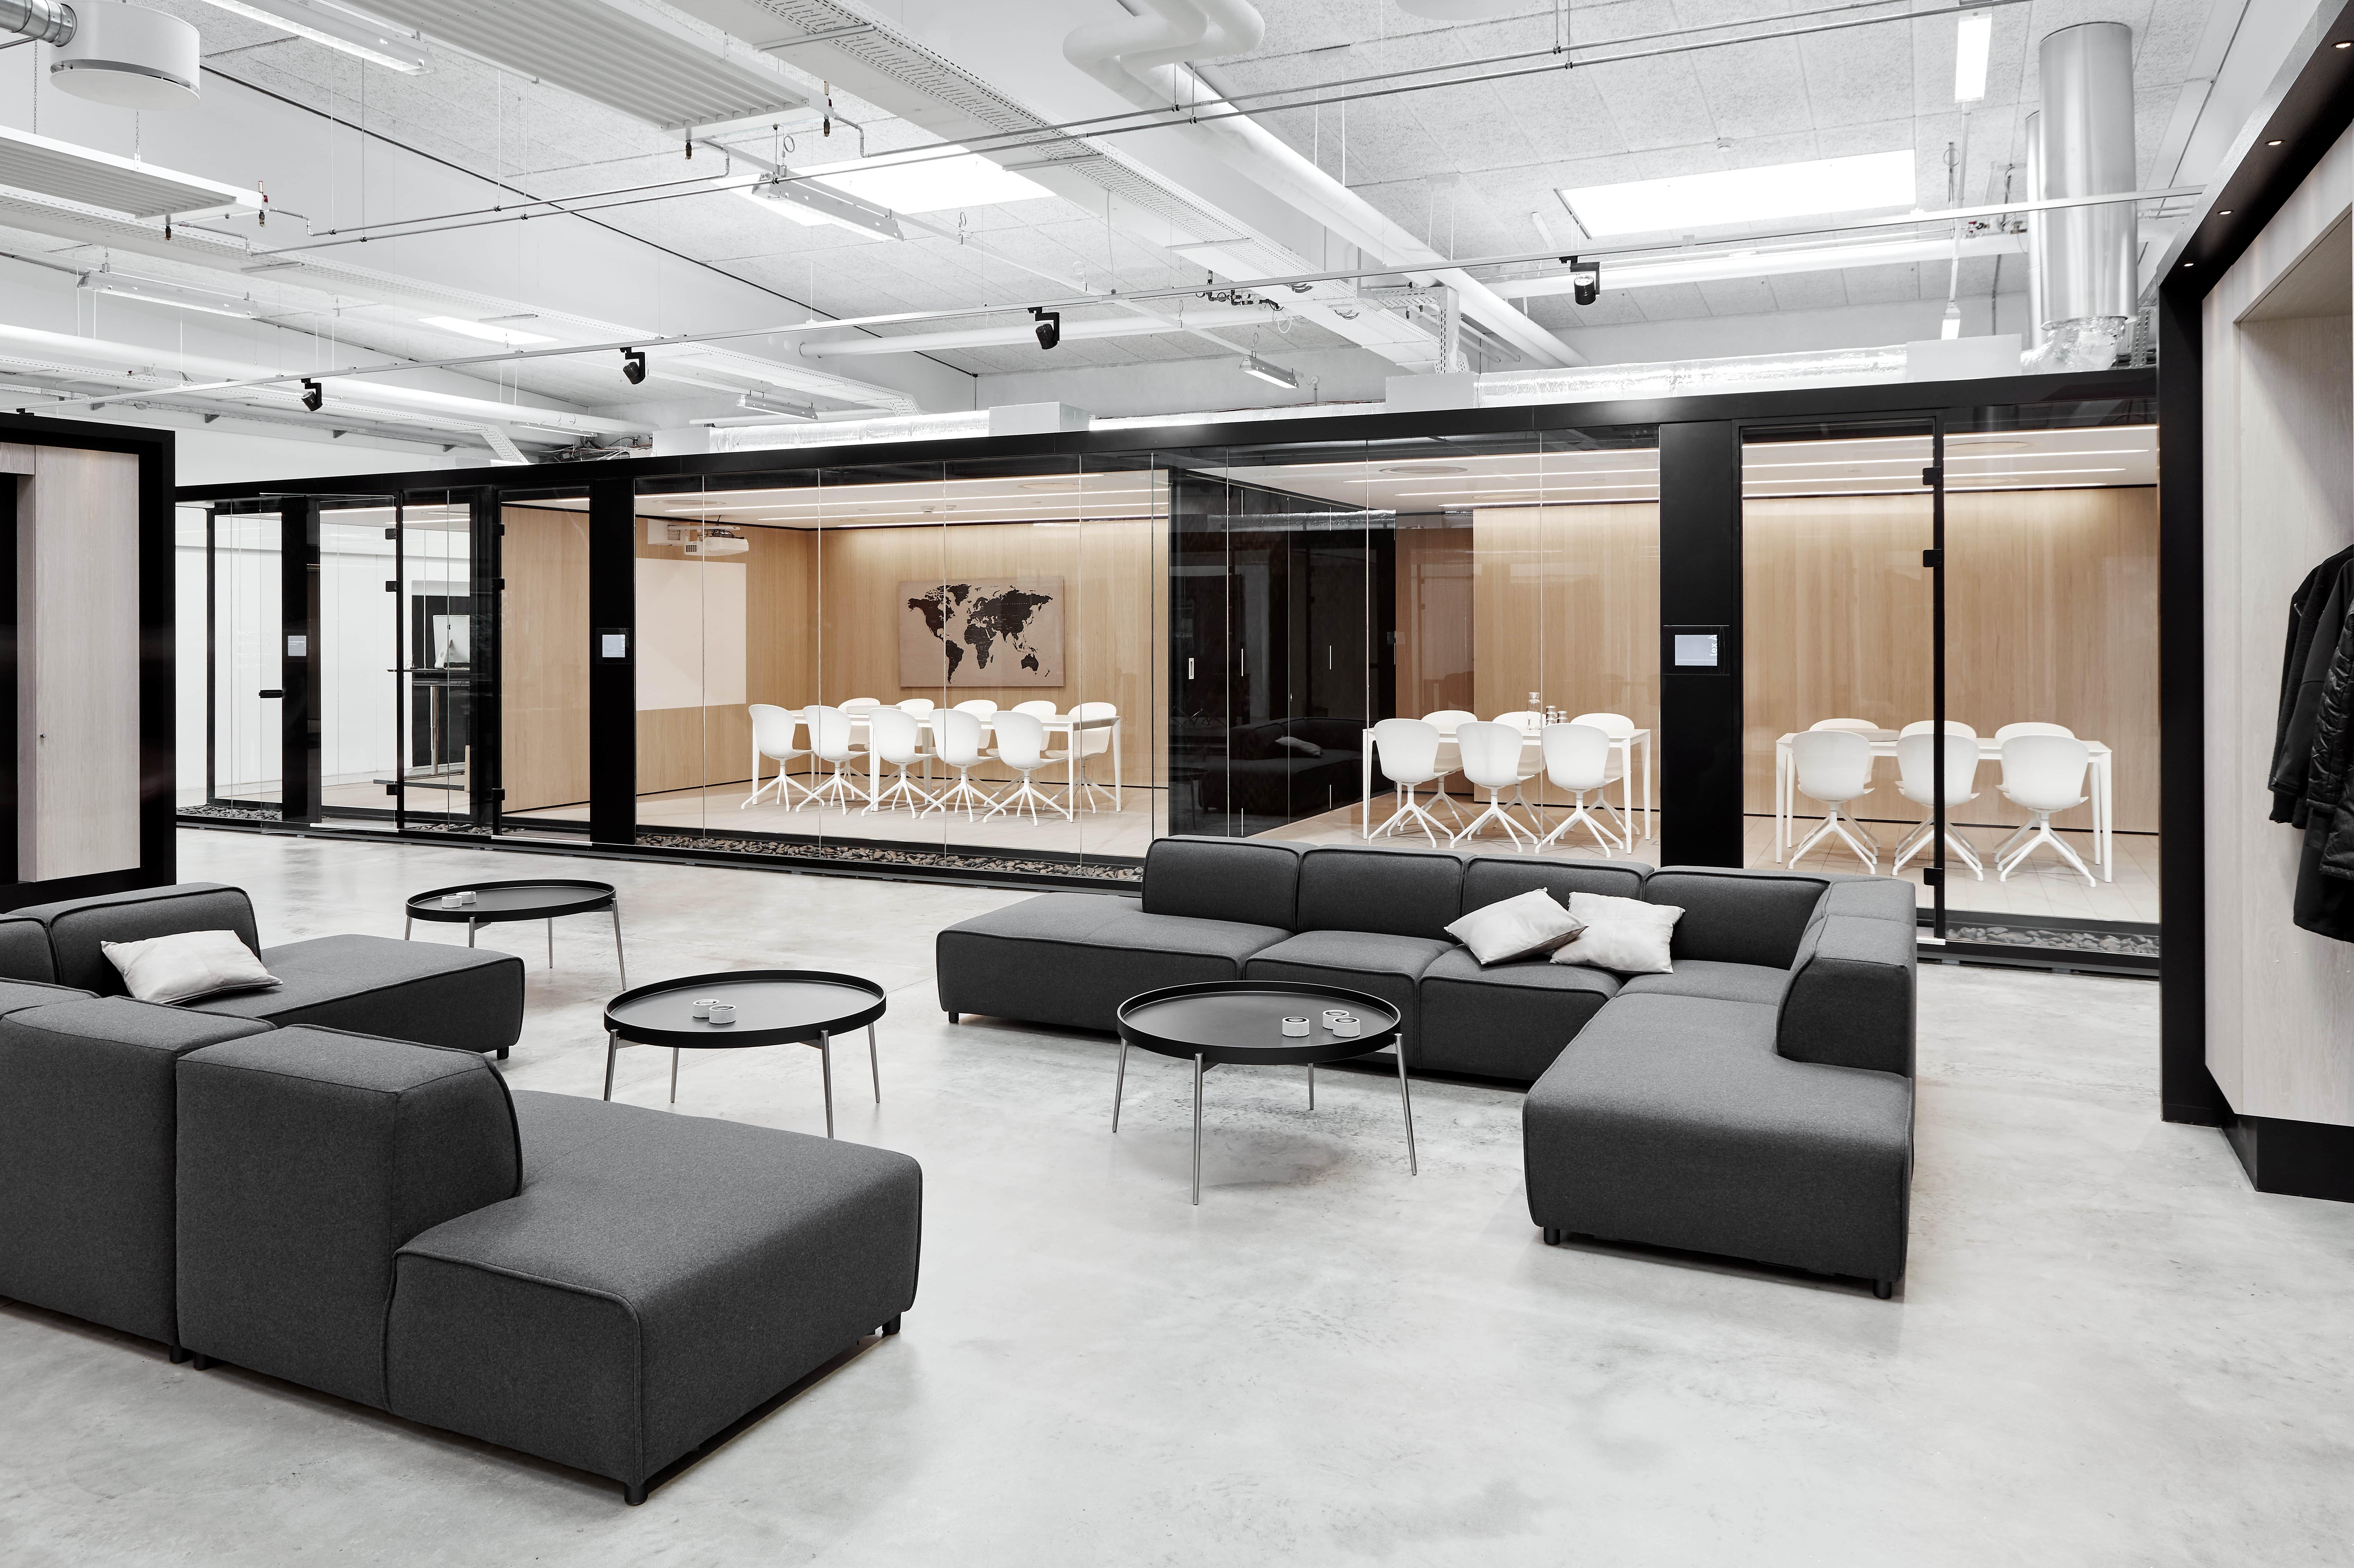 Boconcept Carmo Sofa Mit Dunkelgrauem Lux Felt Stoff Boconcept Scandinavian Boconc In 2020 Office Interior Design Office Lounge Design Modern Office Design